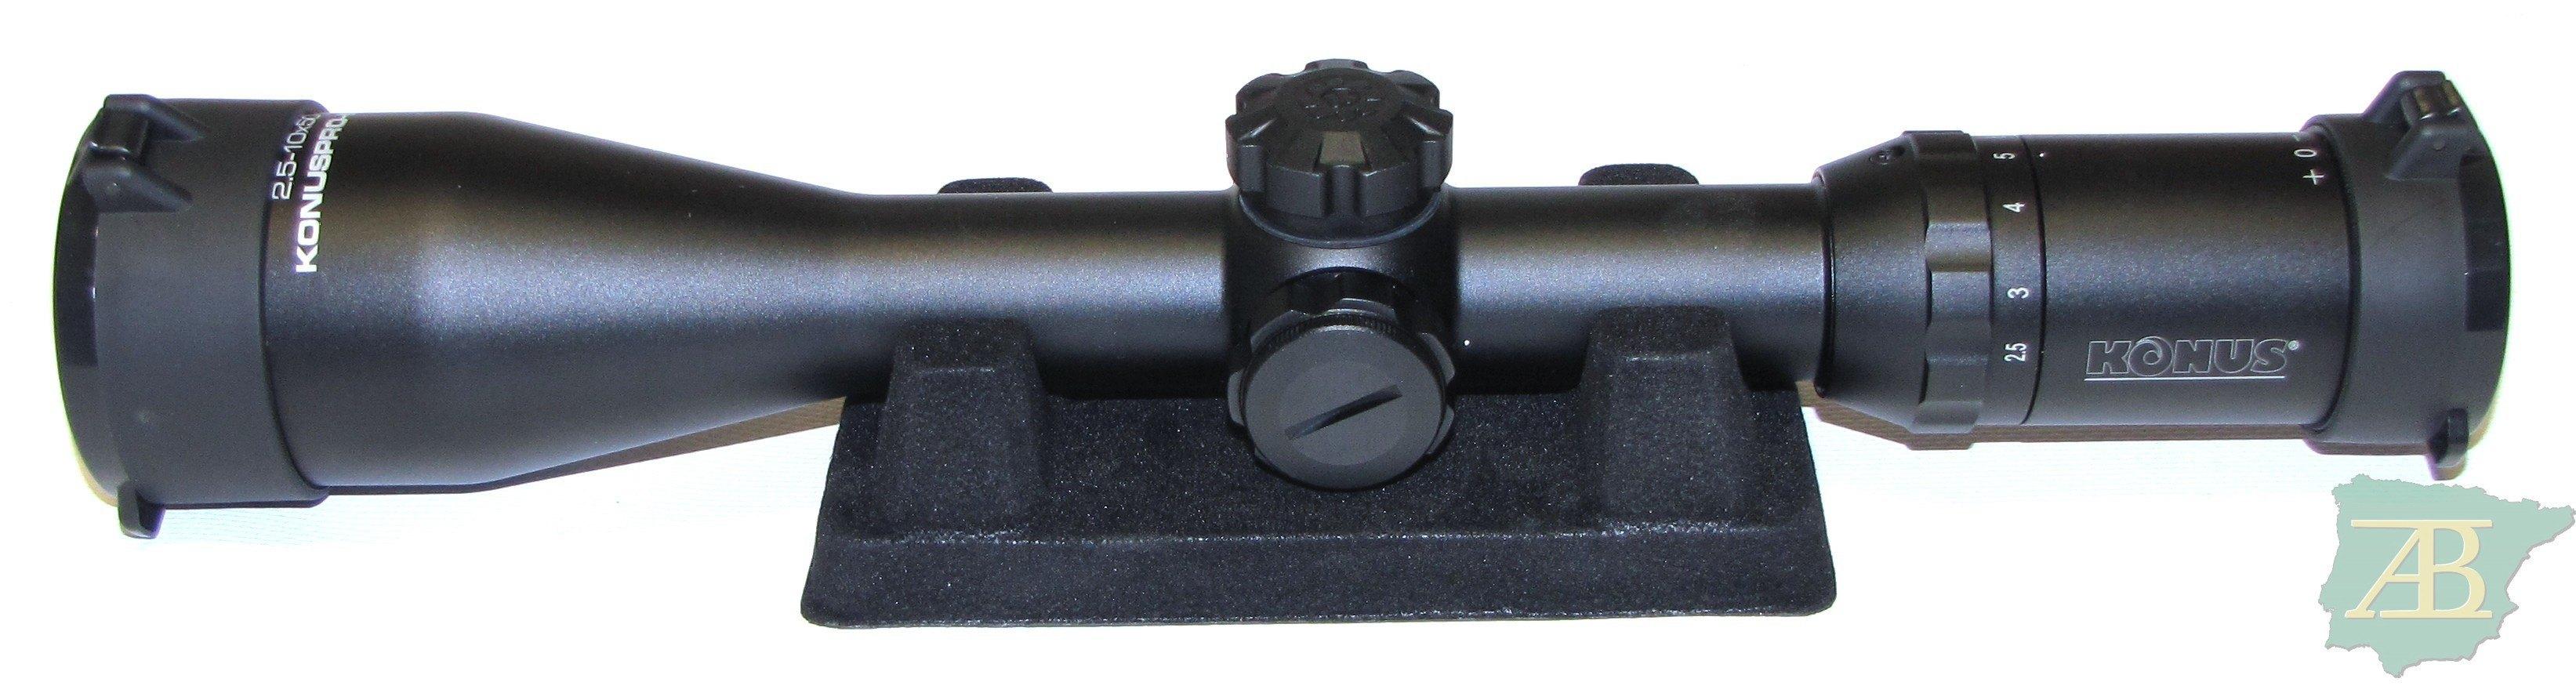 KONUS KONUSPRO-M30 2.5-10X50 RI